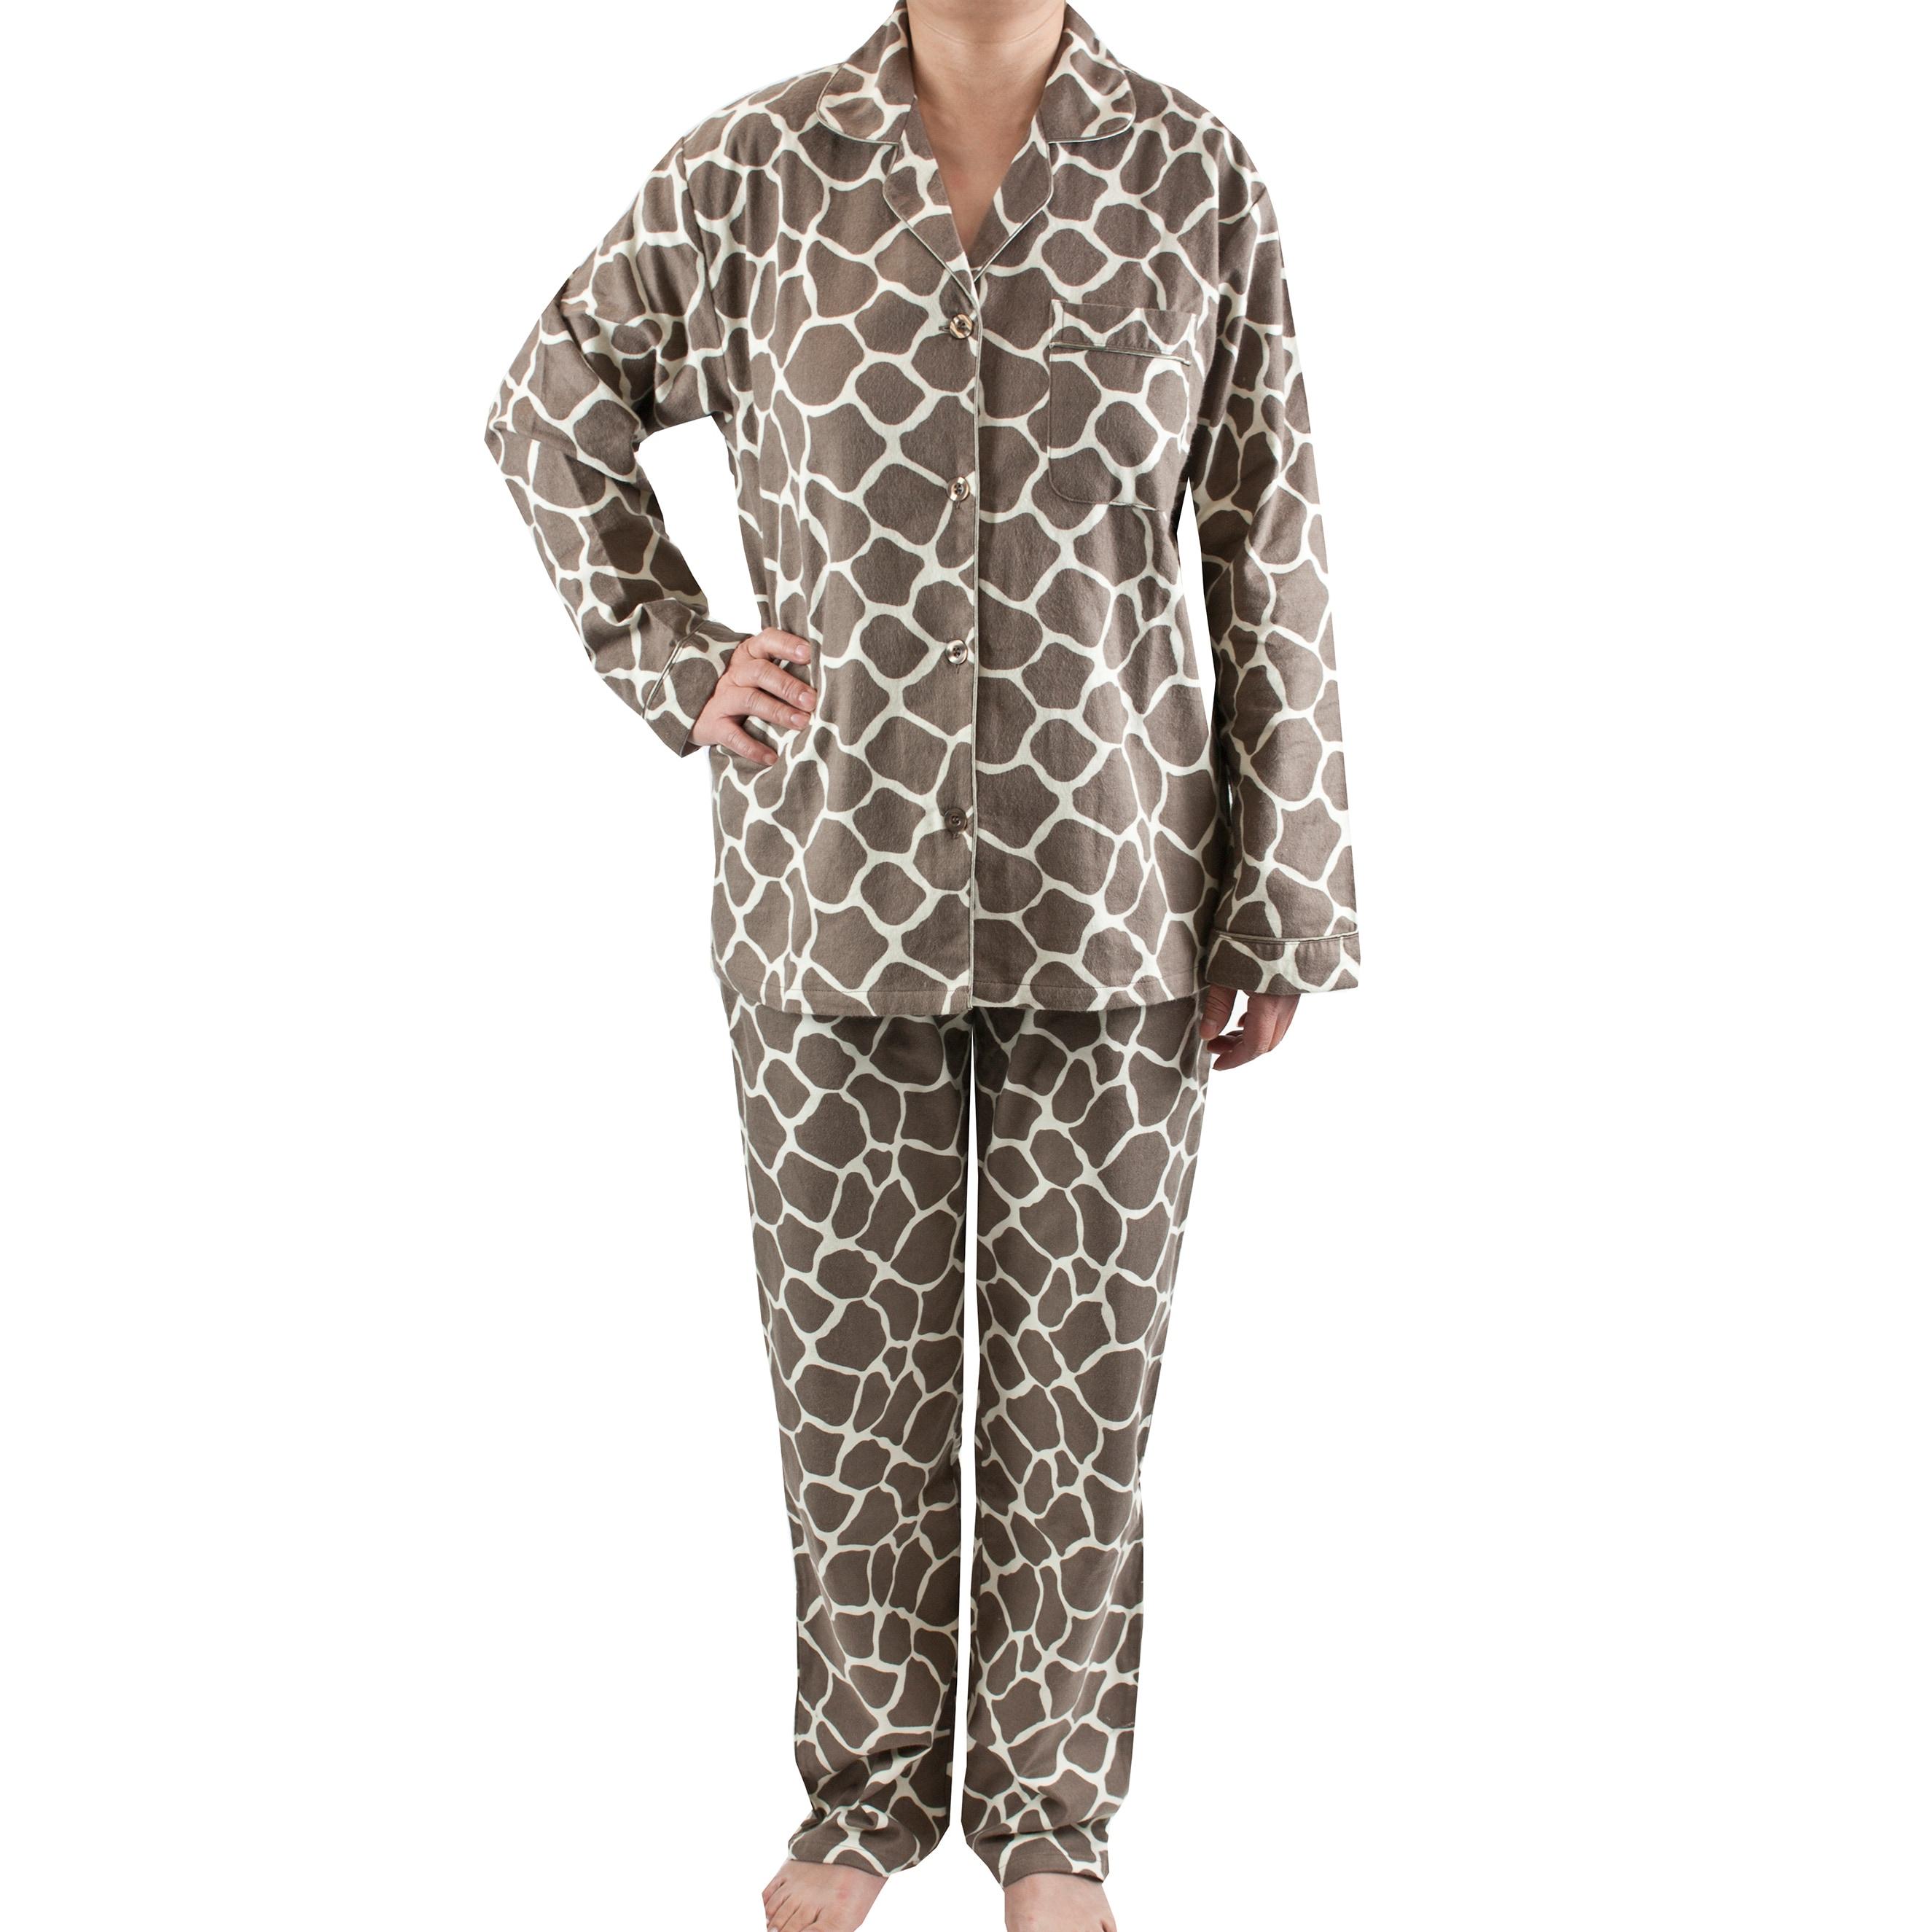 Leisureland Women's Giraffe Print Brushed Cotton Pajama S...